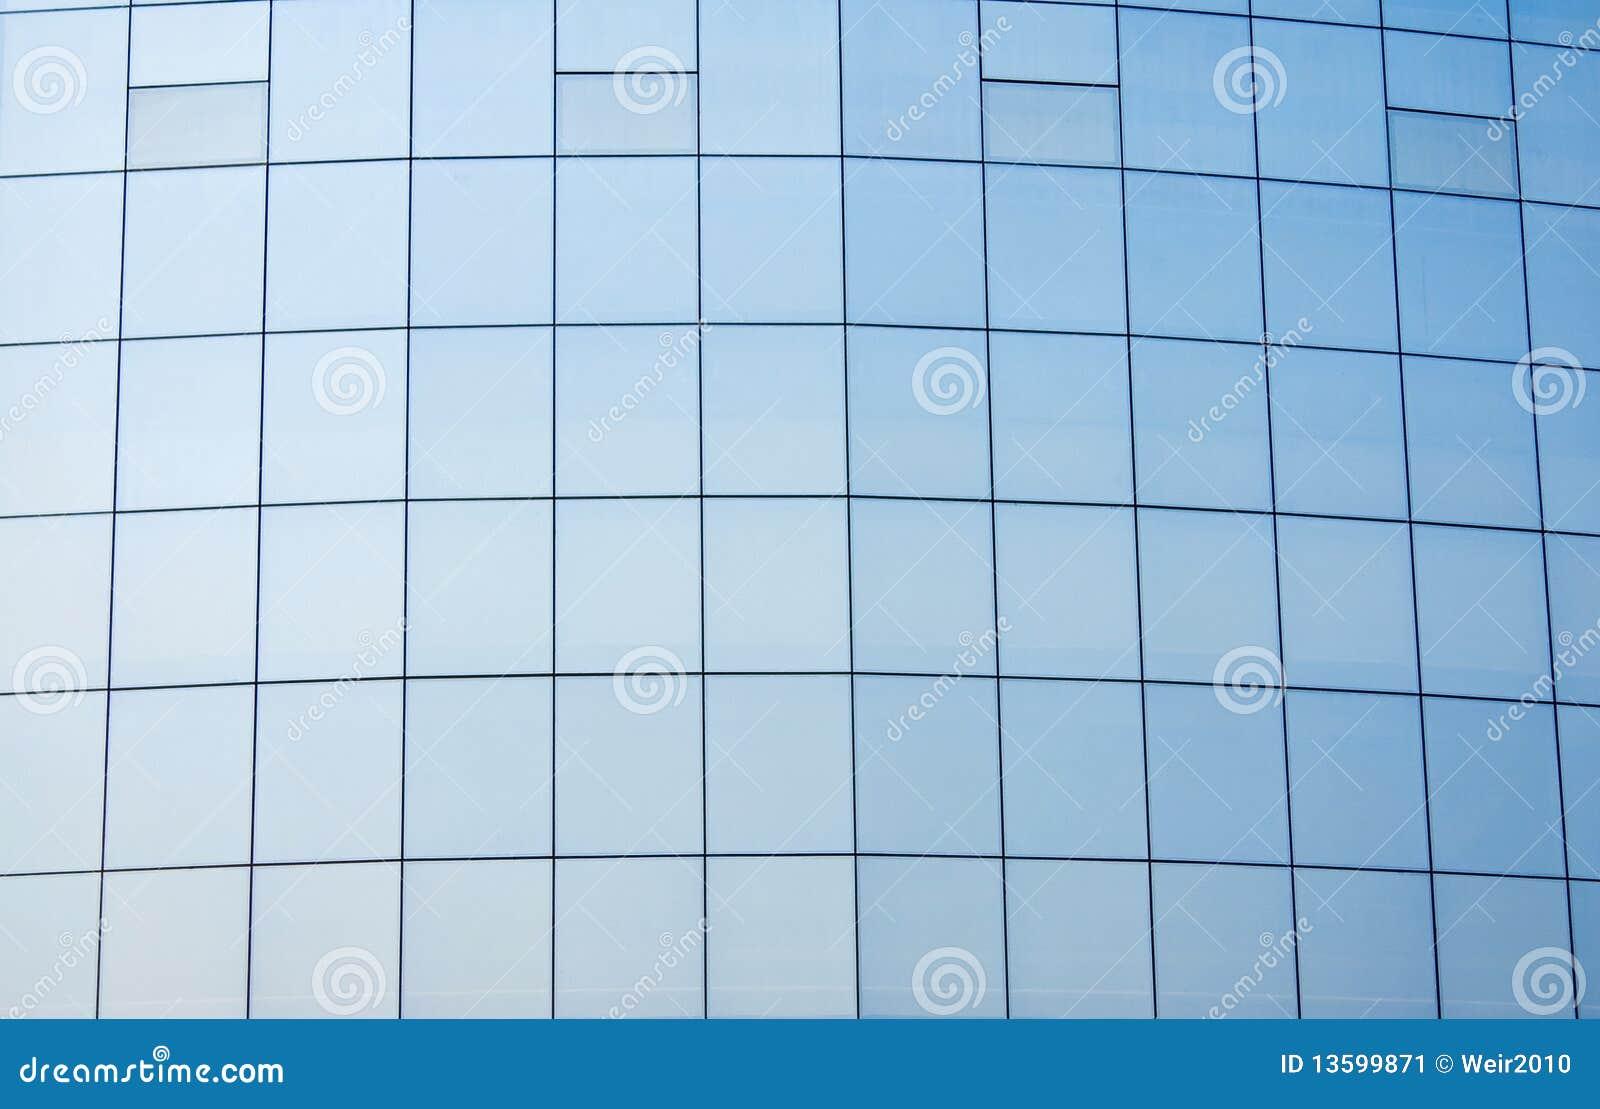 mur rideau en verre image stock image 13599871. Black Bedroom Furniture Sets. Home Design Ideas